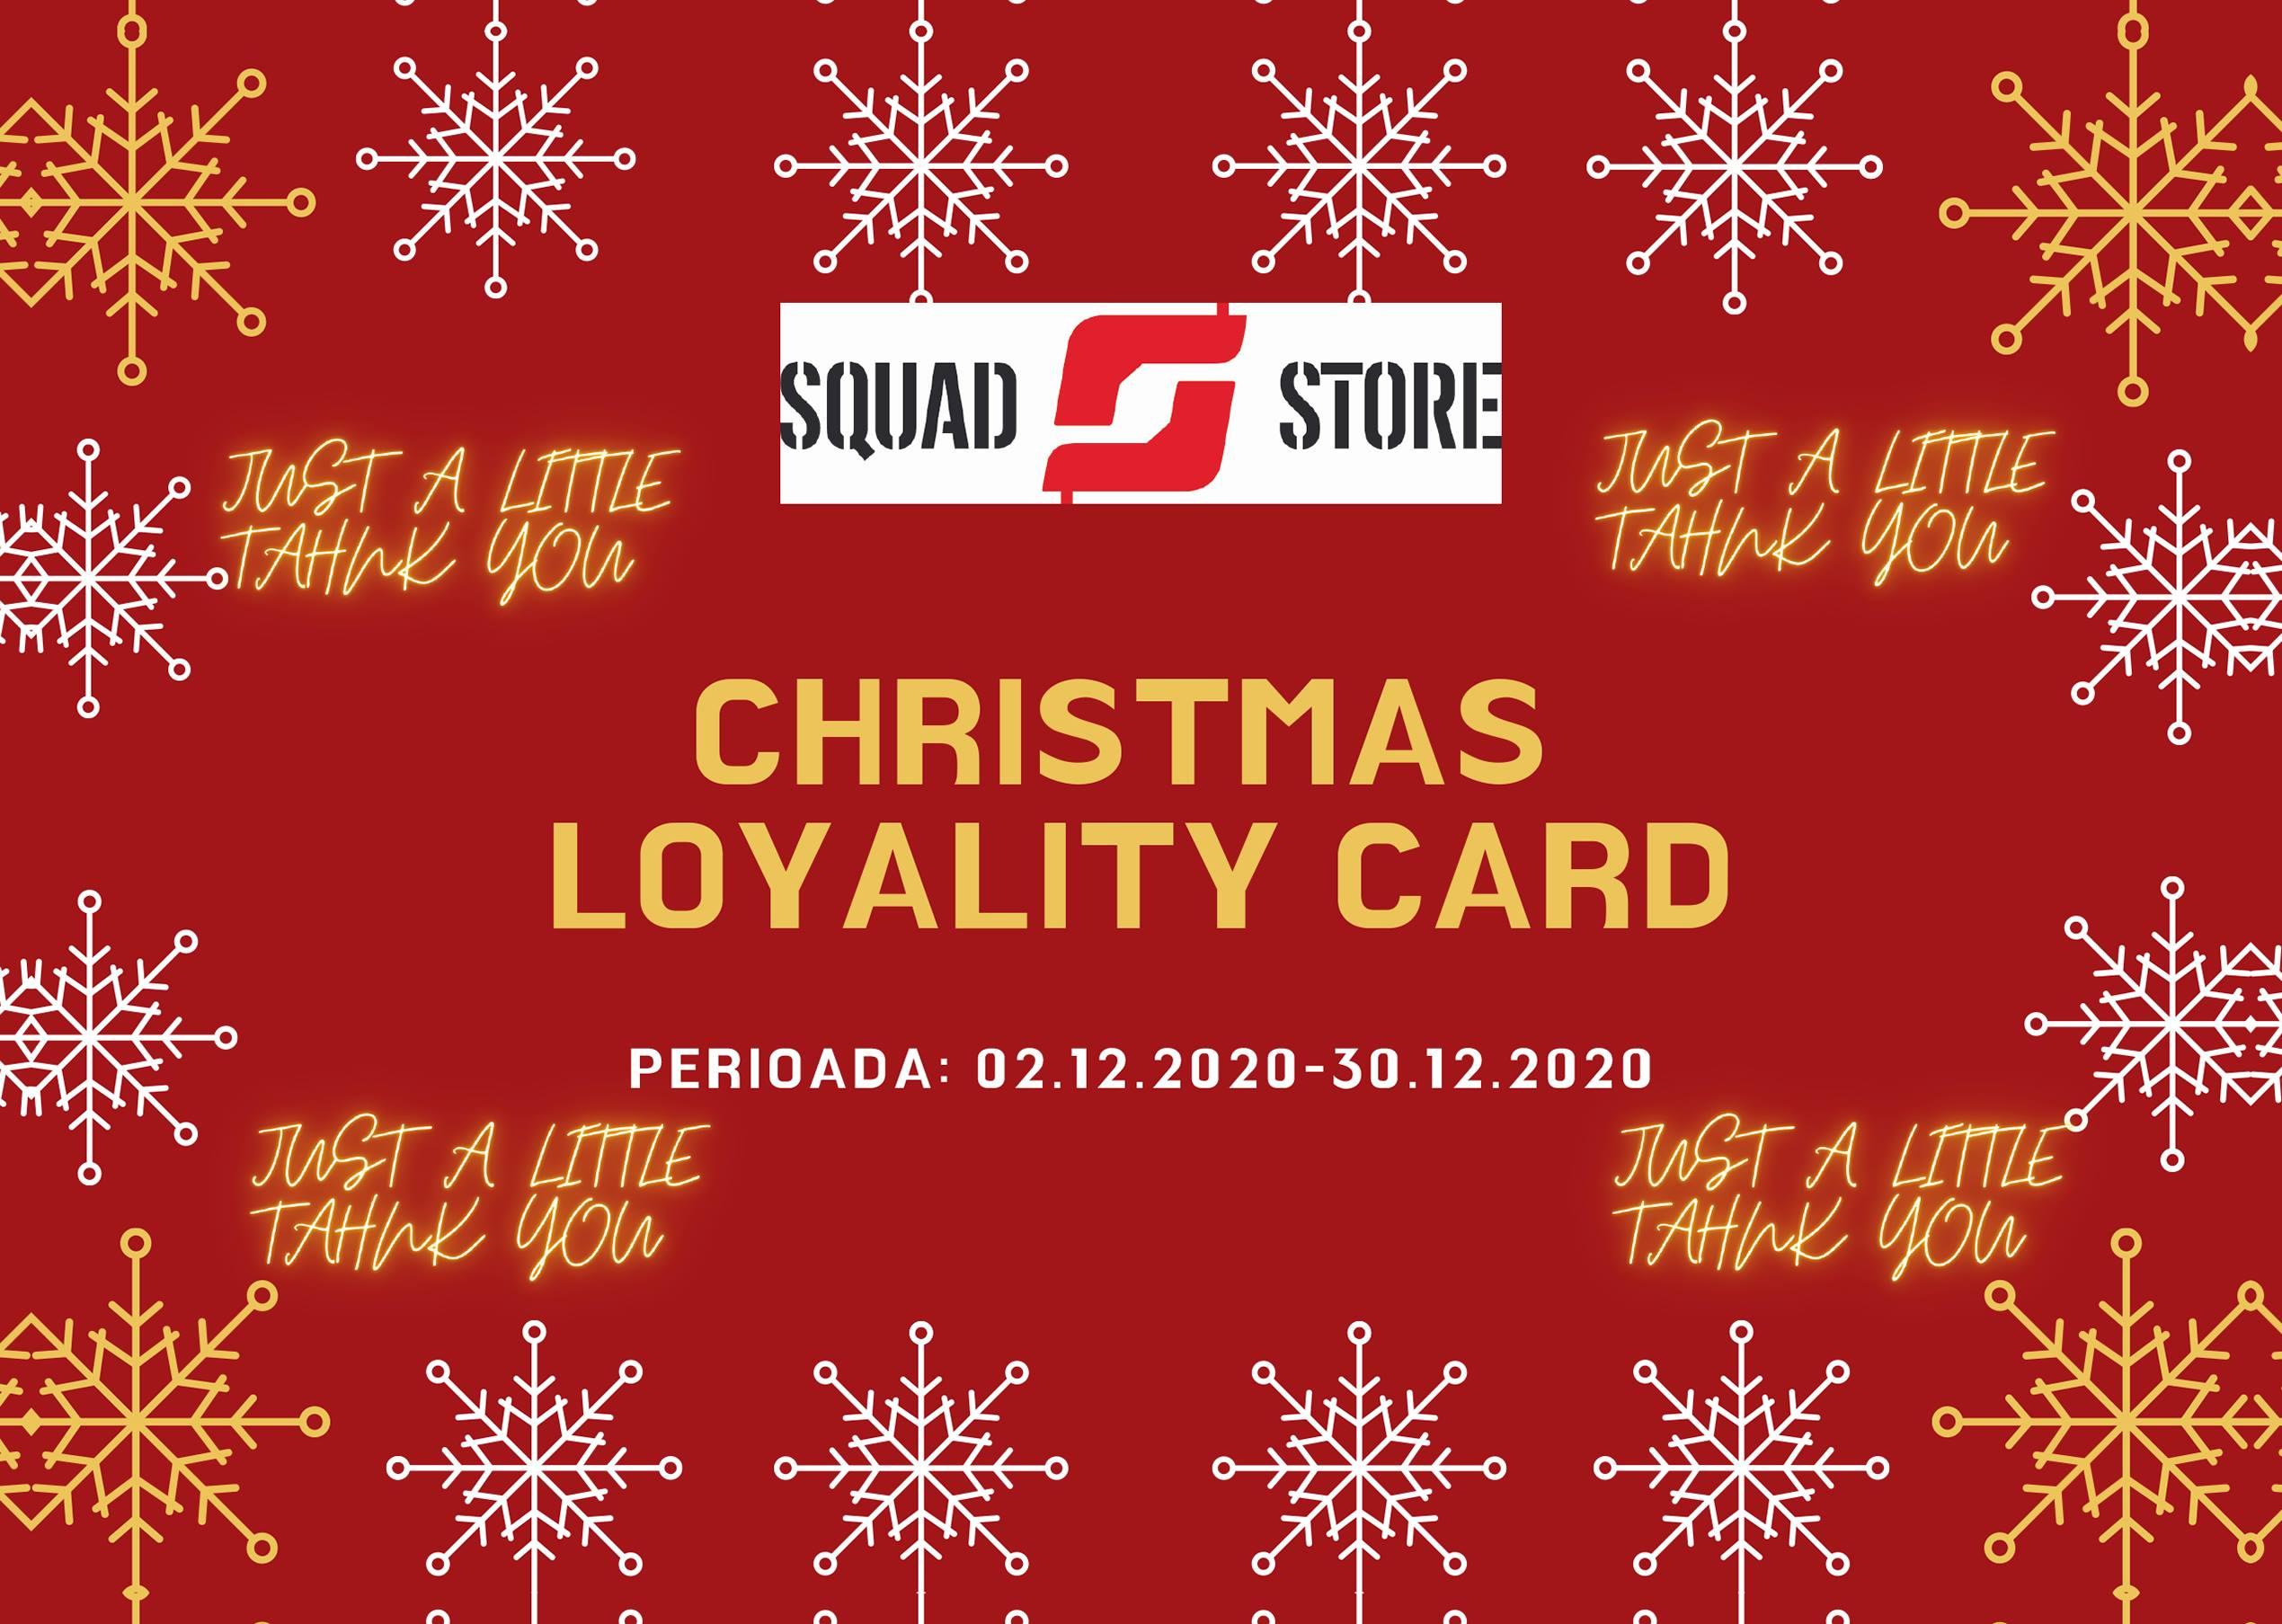 chirstmas loyality cards squad store shooting range